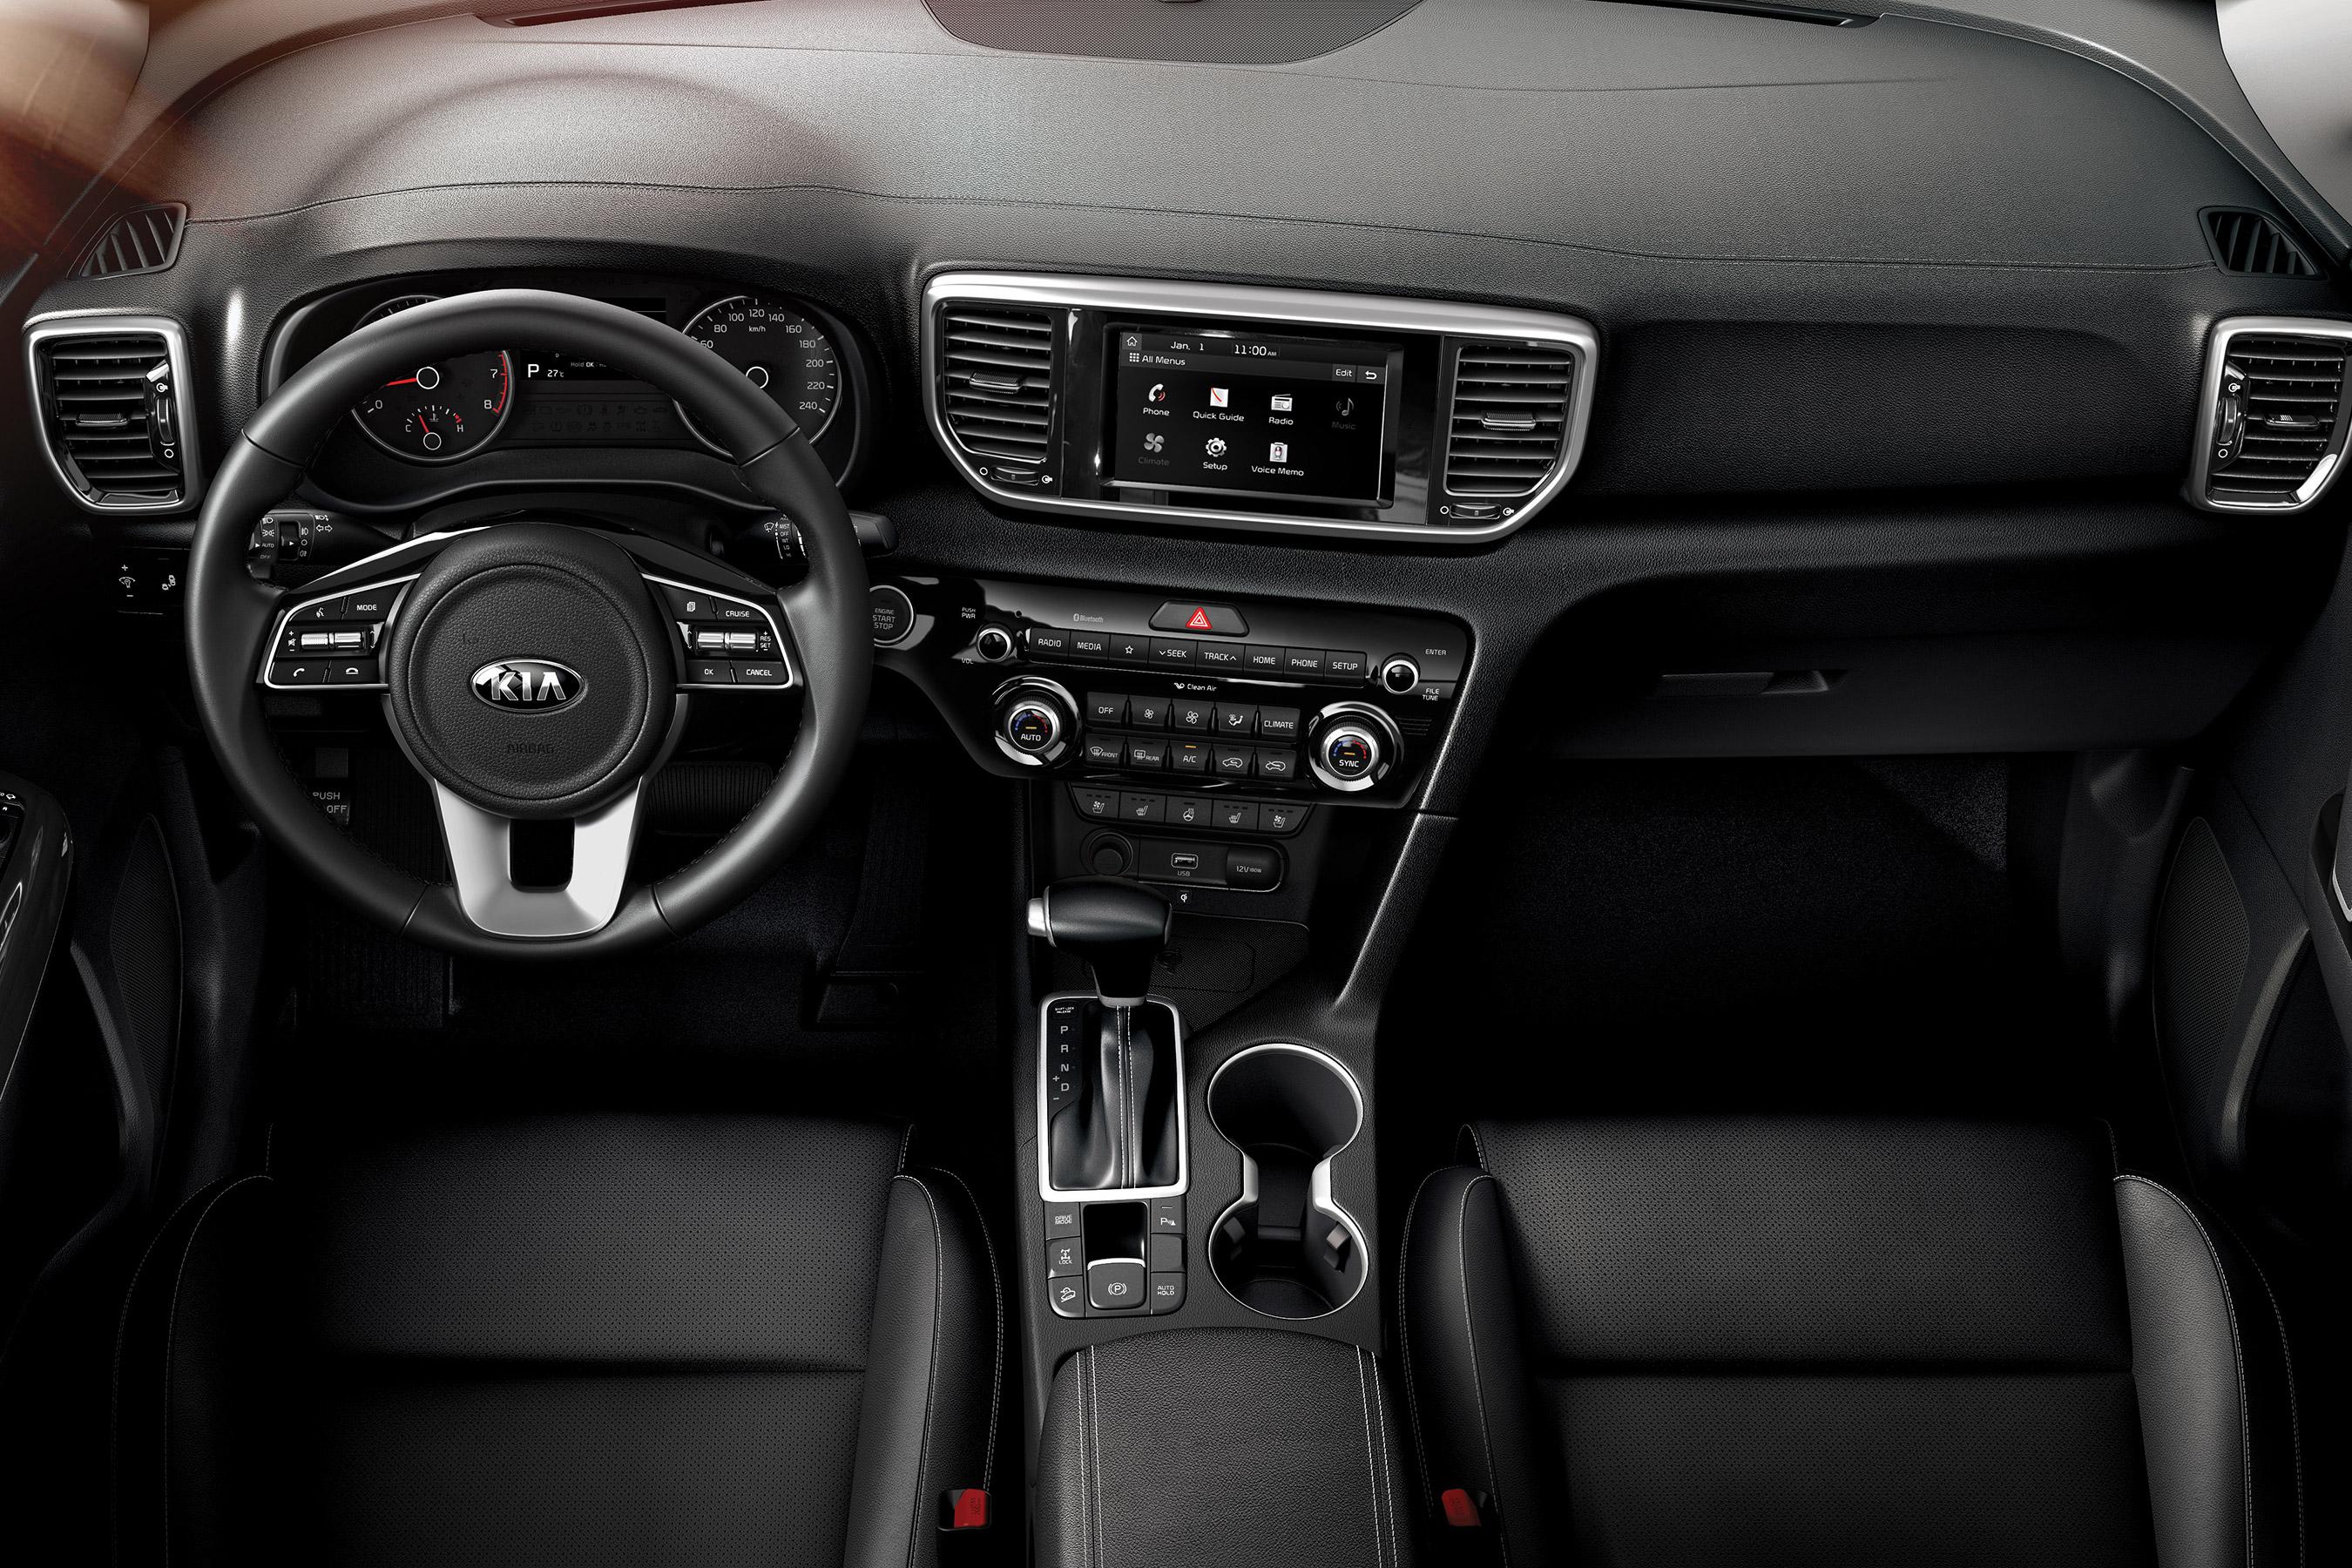 Interior of the 2020 Sportage